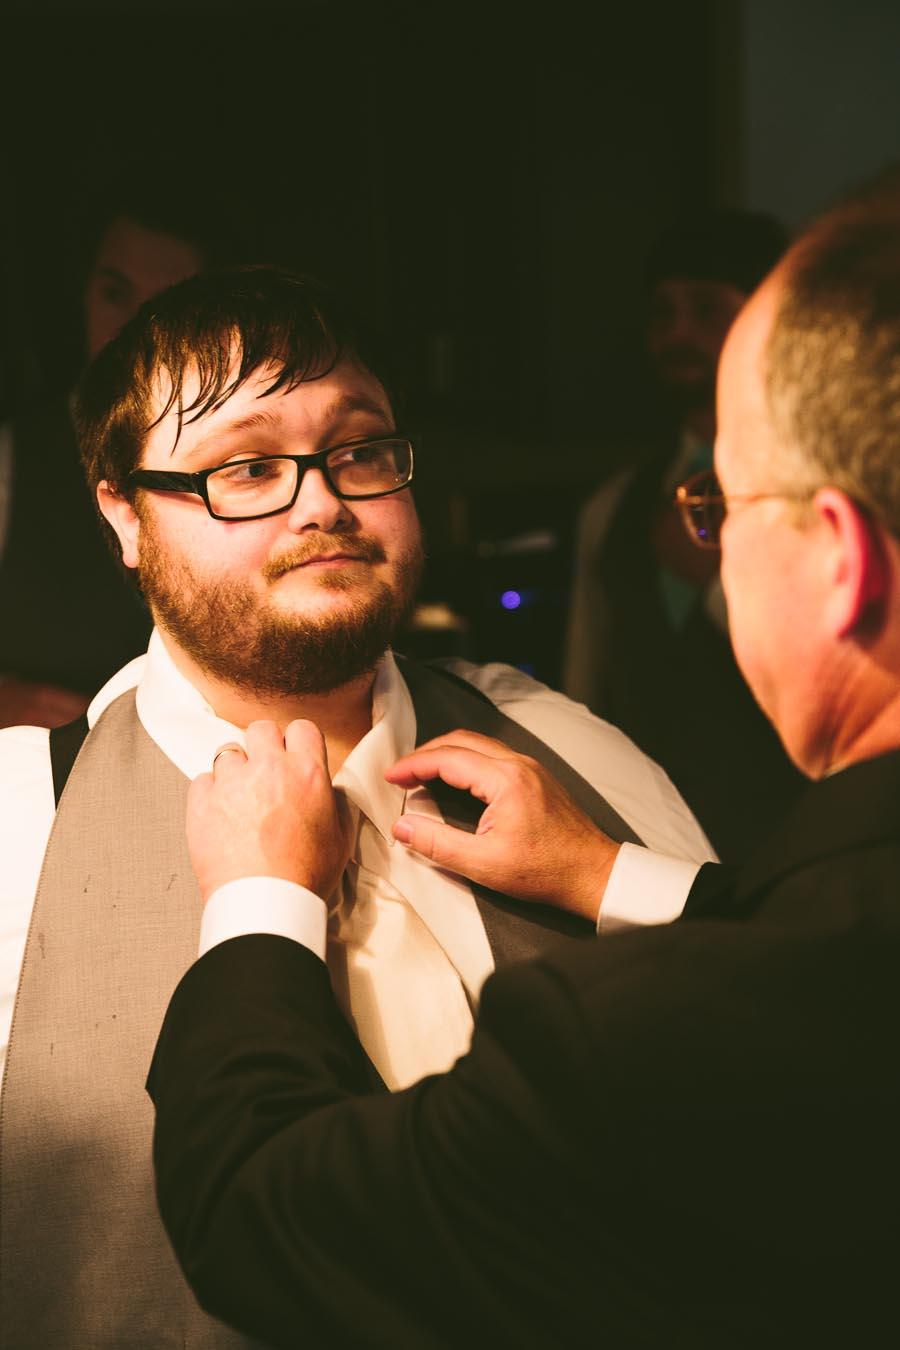 north-olmstead-wedding-photography-at-rubys-grafton-57.jpg